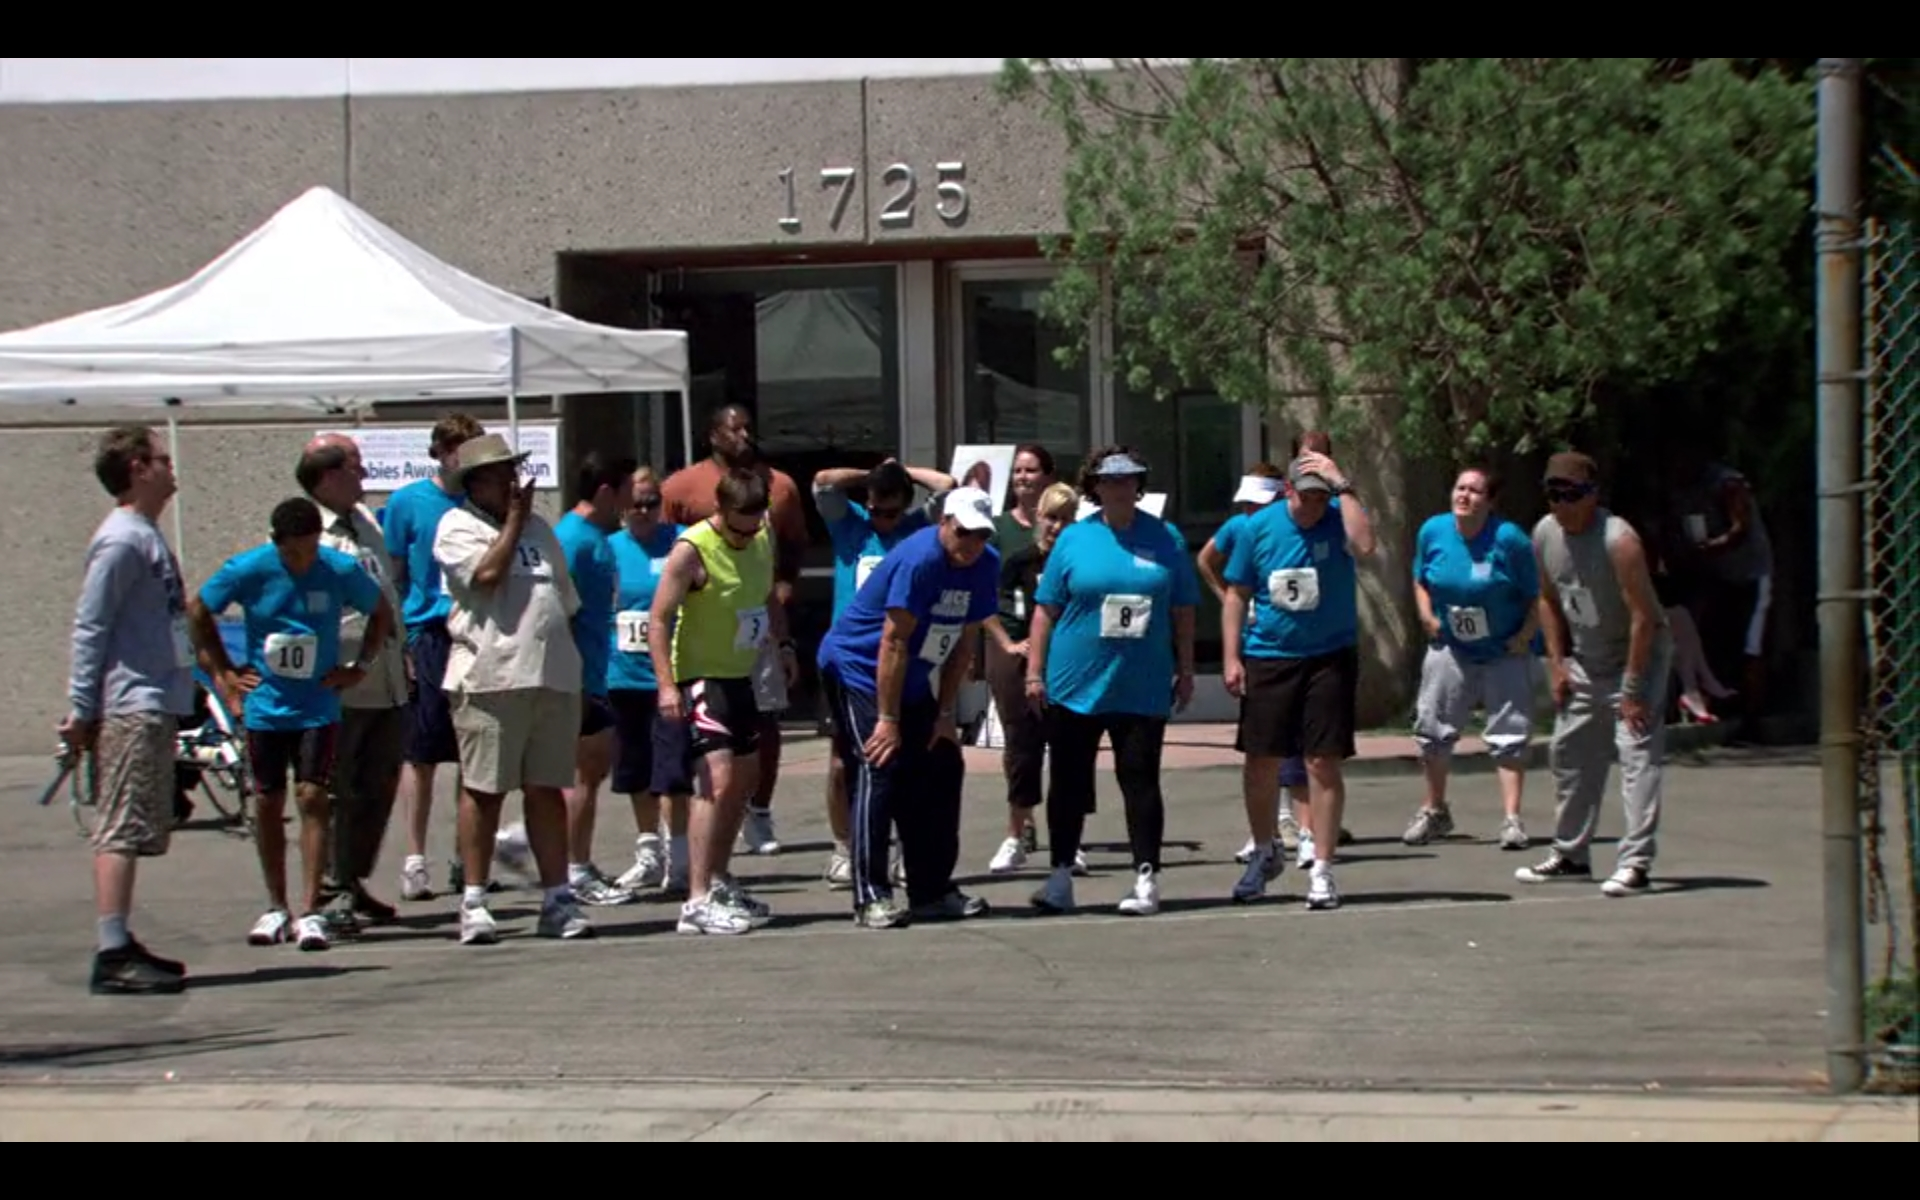 Michael Scott's Dunder Mifflin Scranton Meredith Palmer Memorial Celebrity Rabies Awareness Pro-Am Fun Run Race For the Cure